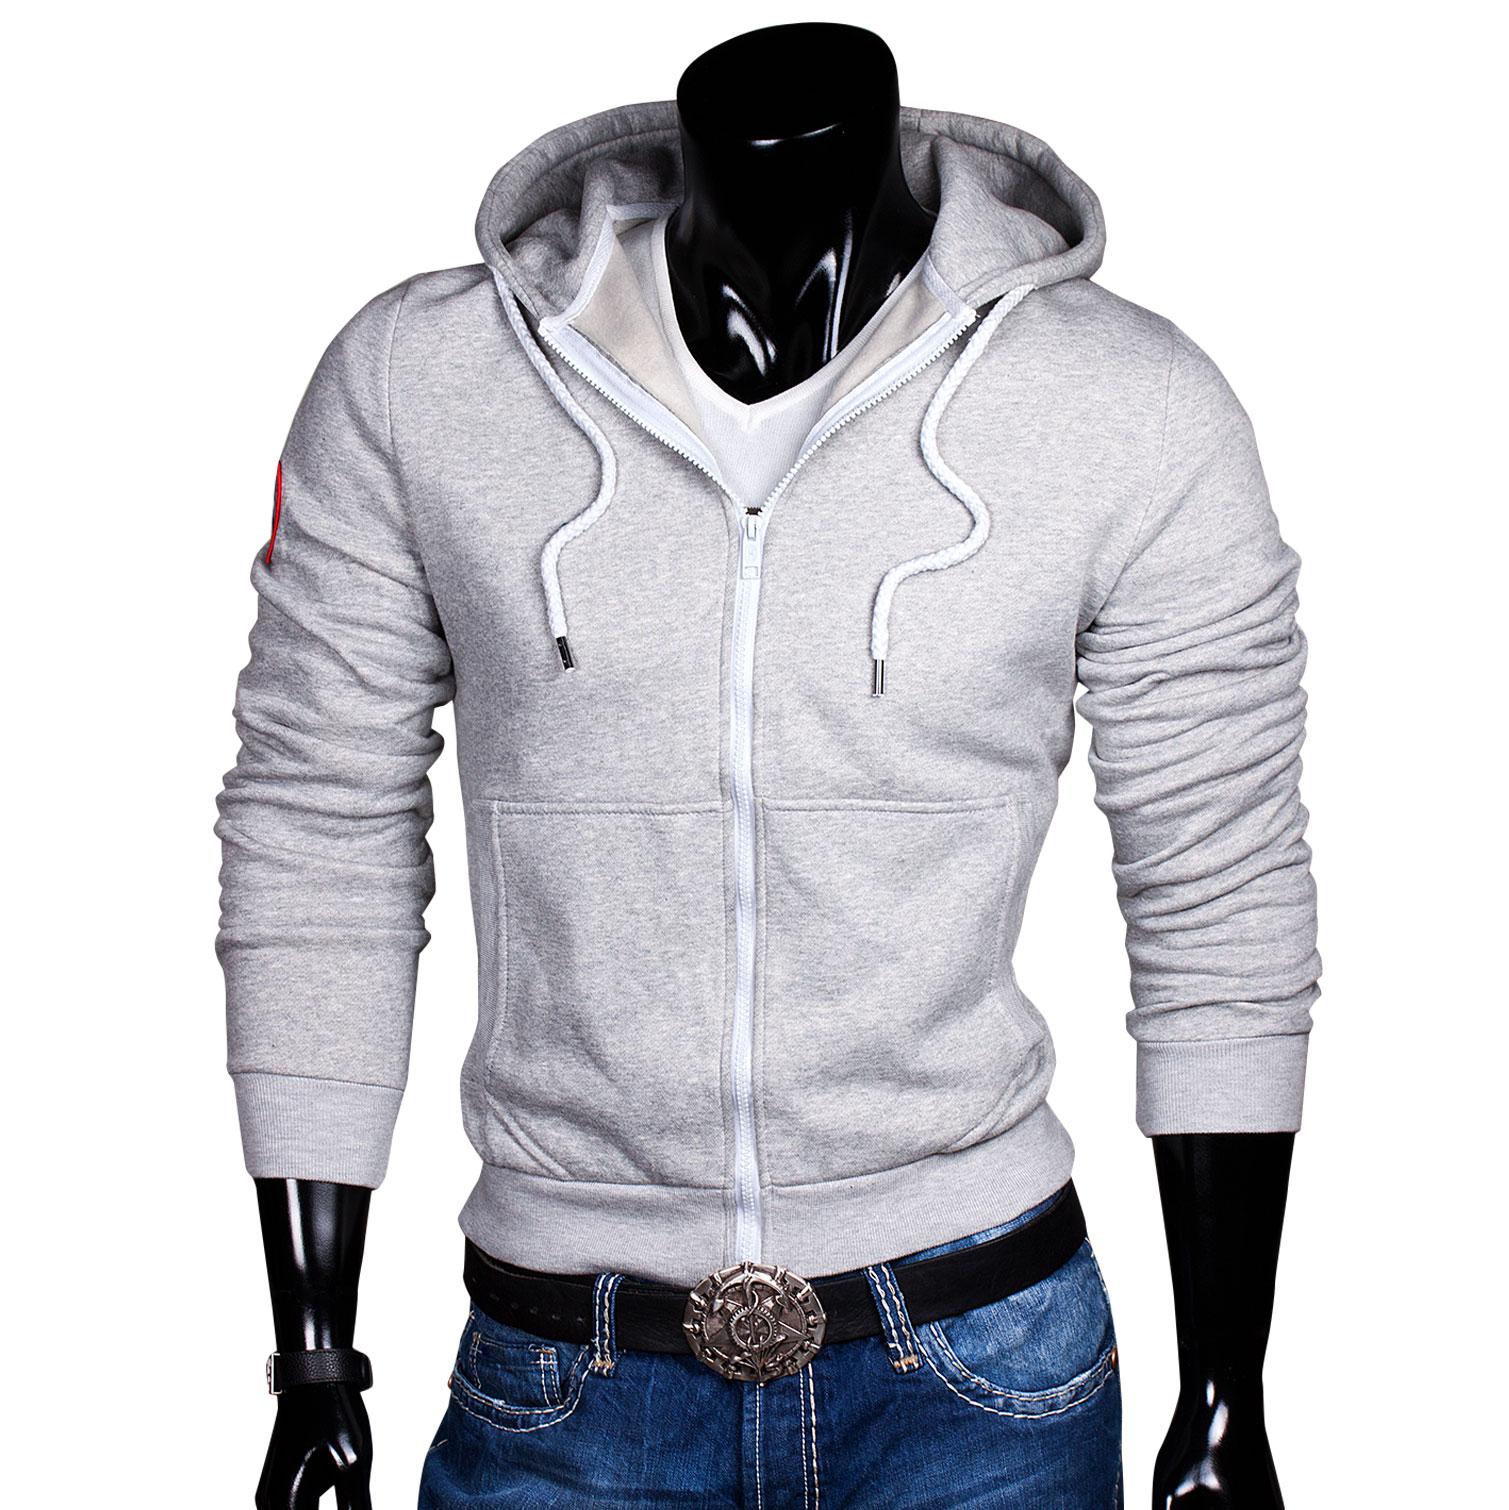 kapuzen pullover sweat hoodie jacke pulli herren sweatjacke zipper hoody grau xl ebay. Black Bedroom Furniture Sets. Home Design Ideas